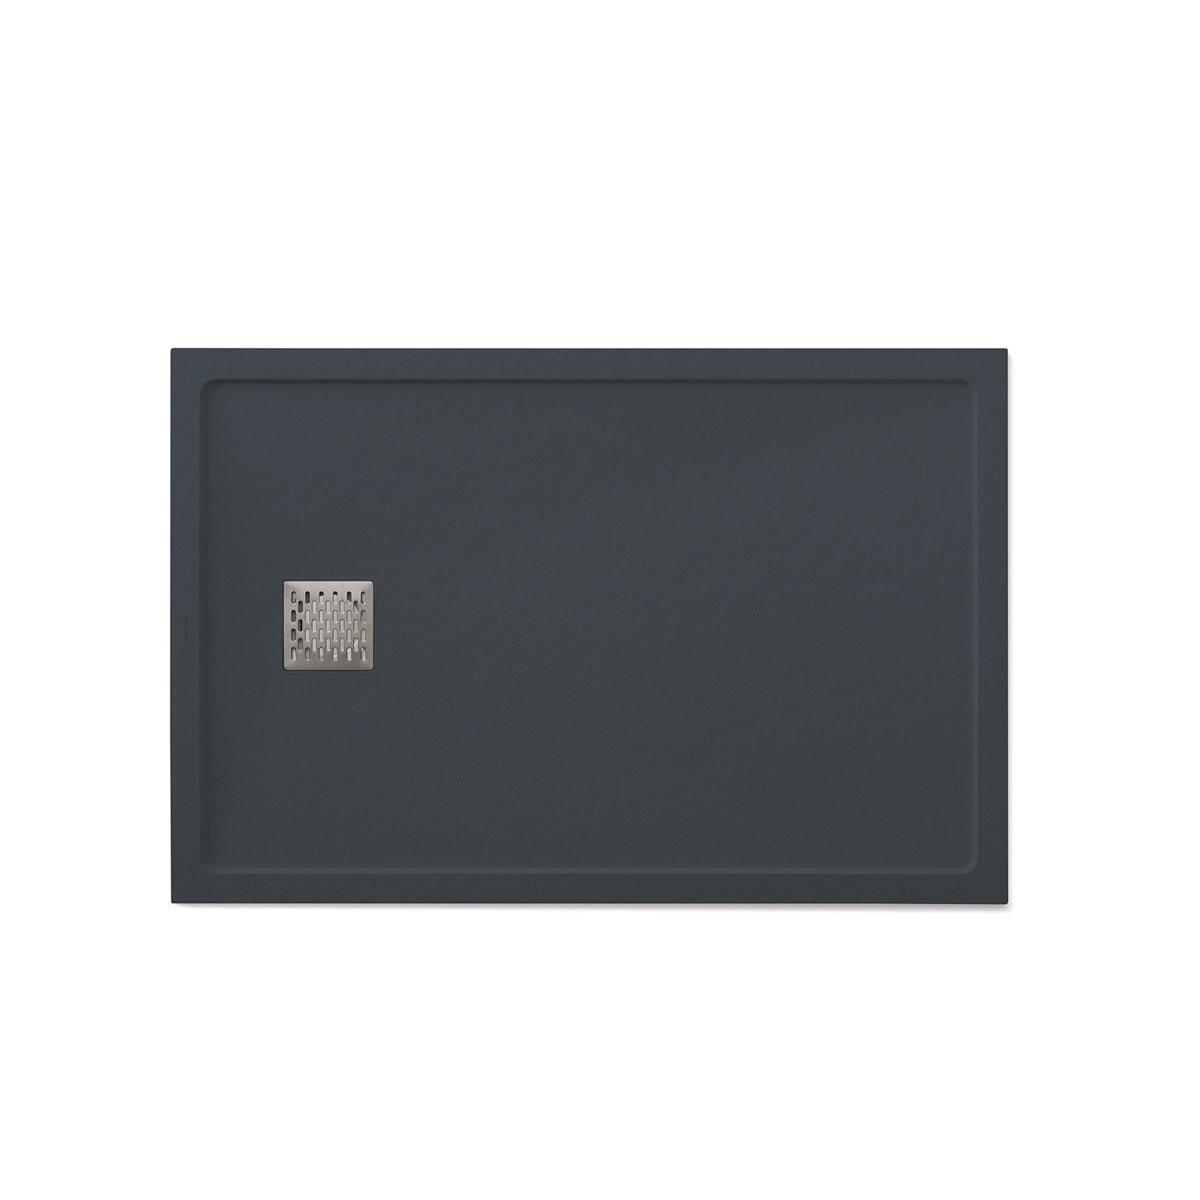 Plato de ducha rectangular 120x80 Ares Stone Nox Antracita